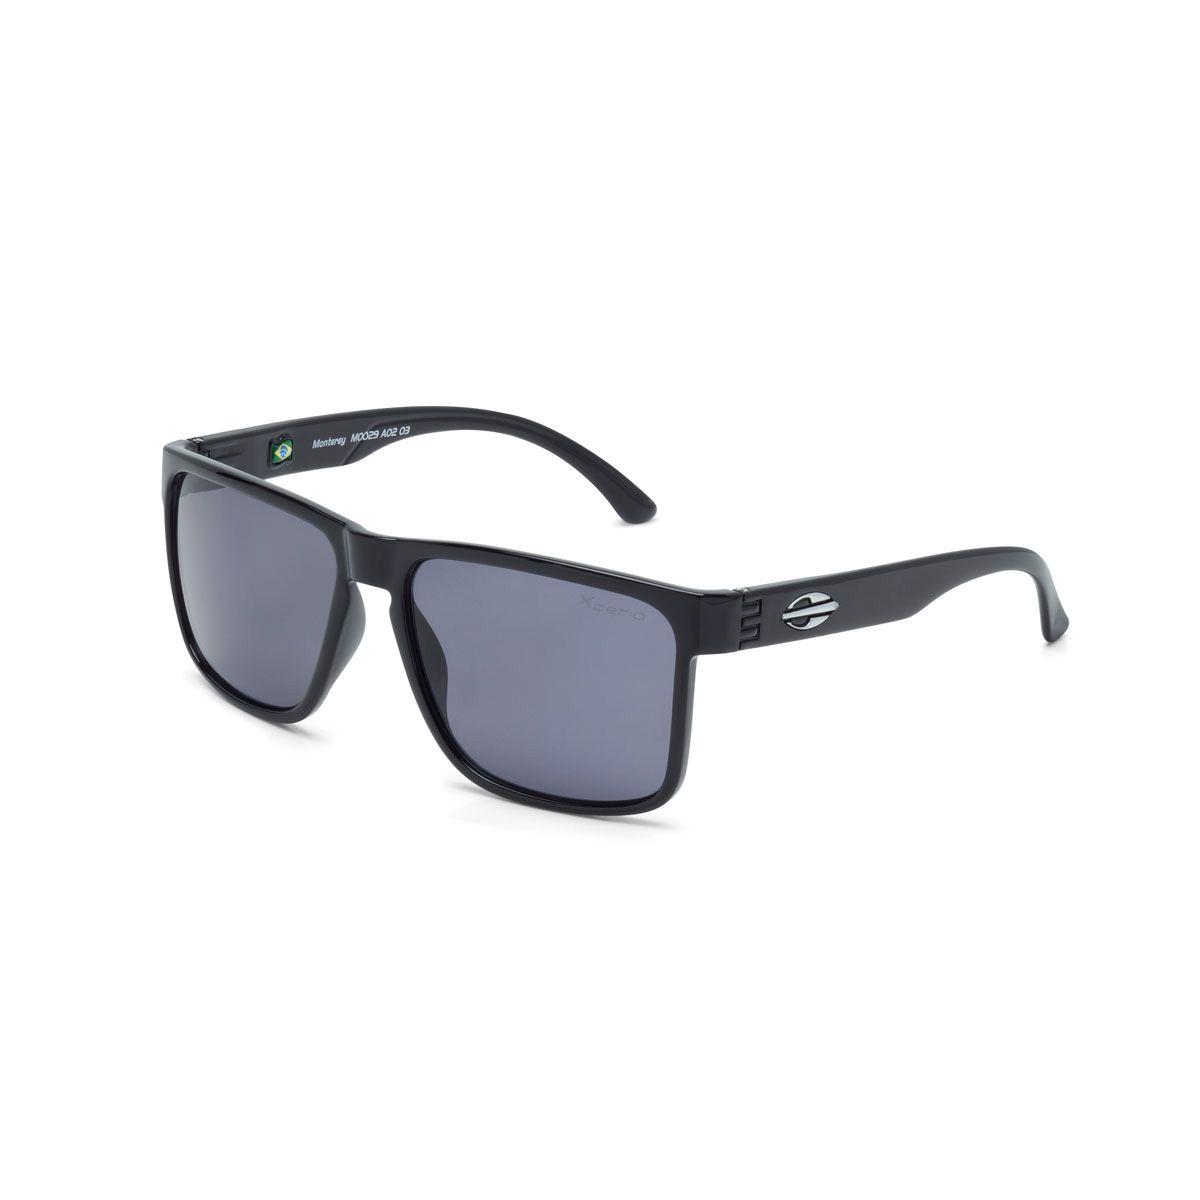 Óculos de Sol Mormaii Monterey M0029A0203   Óculos   Pinterest 8cc1c31a33